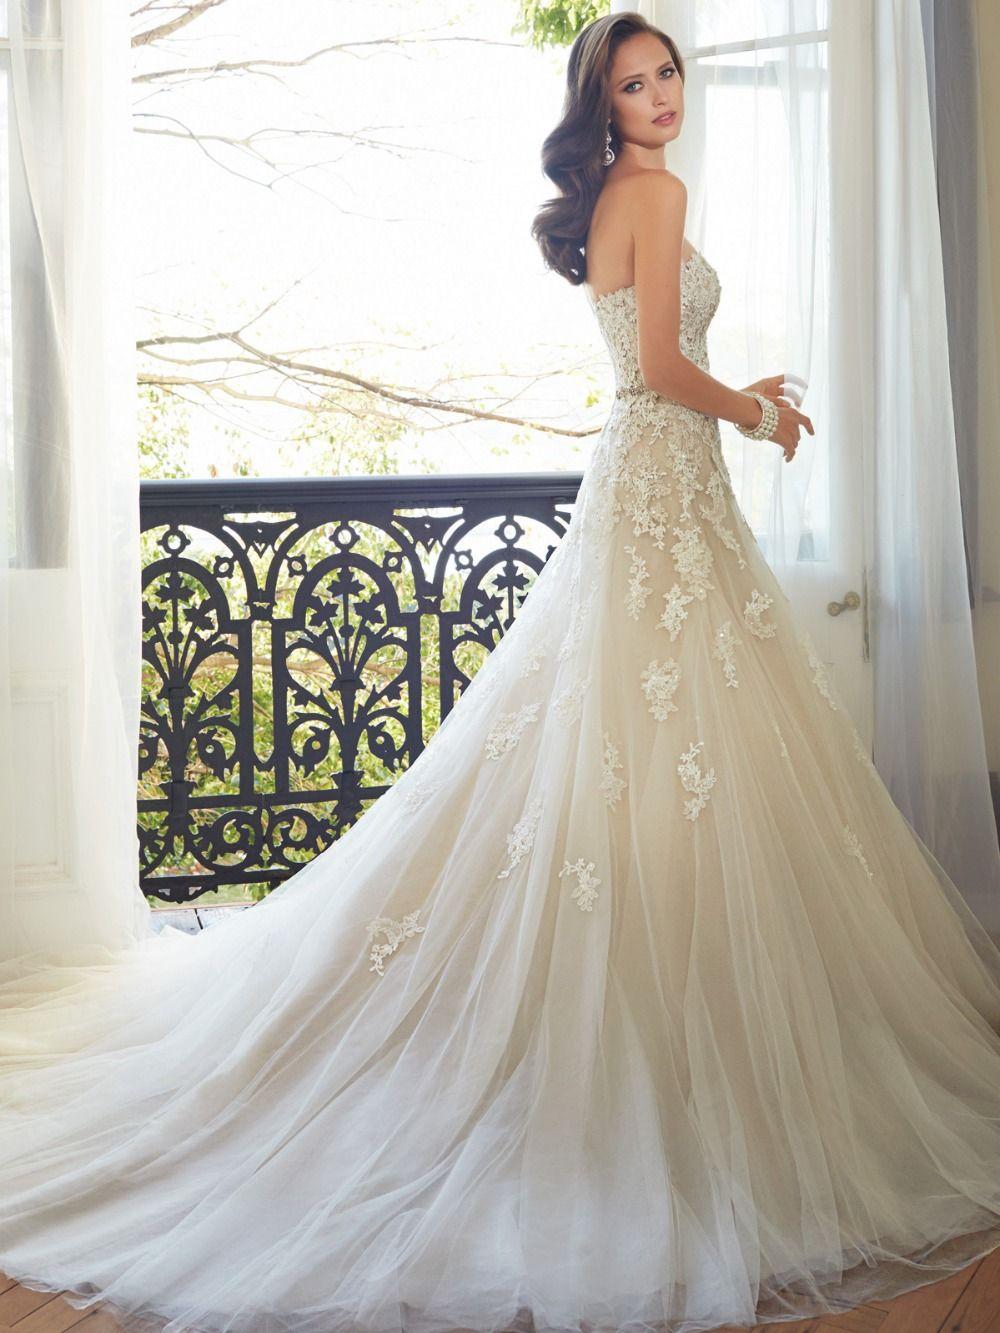 Light Colored Wedding Dresses